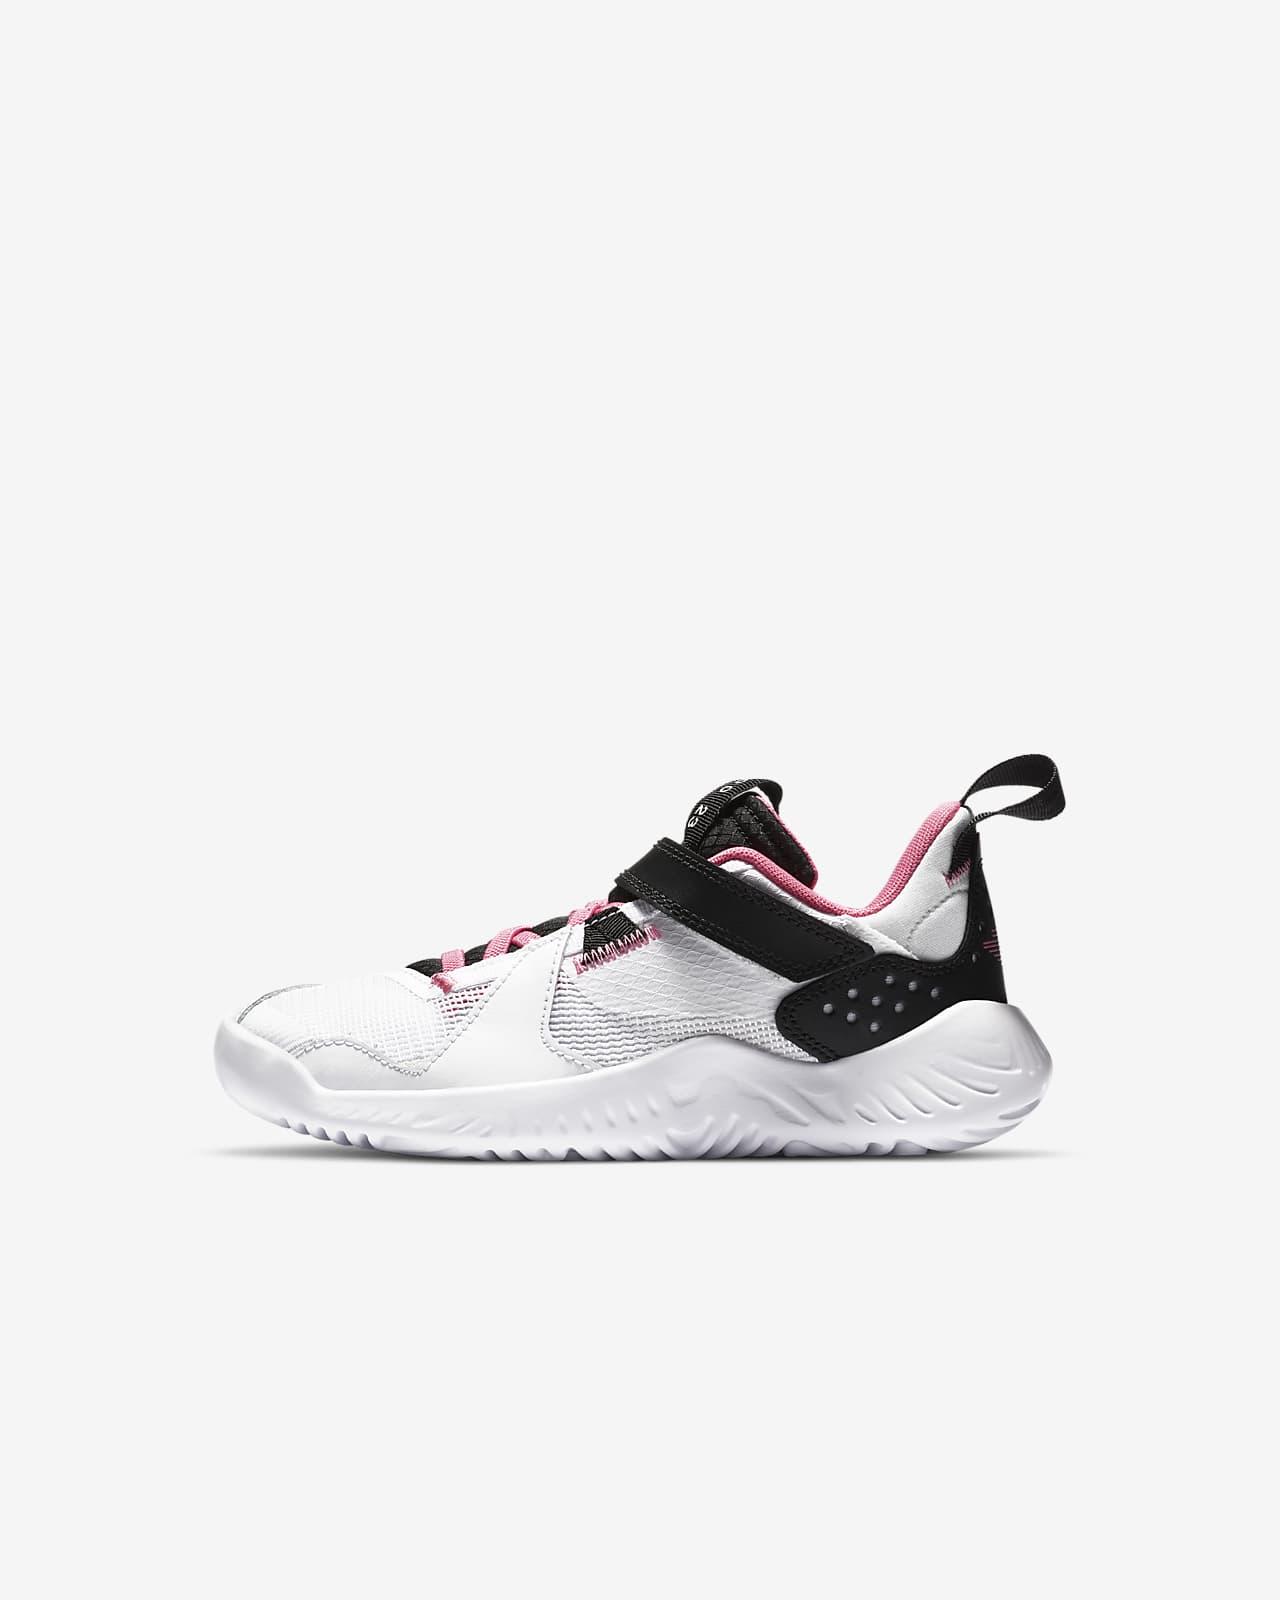 Jordan Delta (PS) 幼童运动童鞋